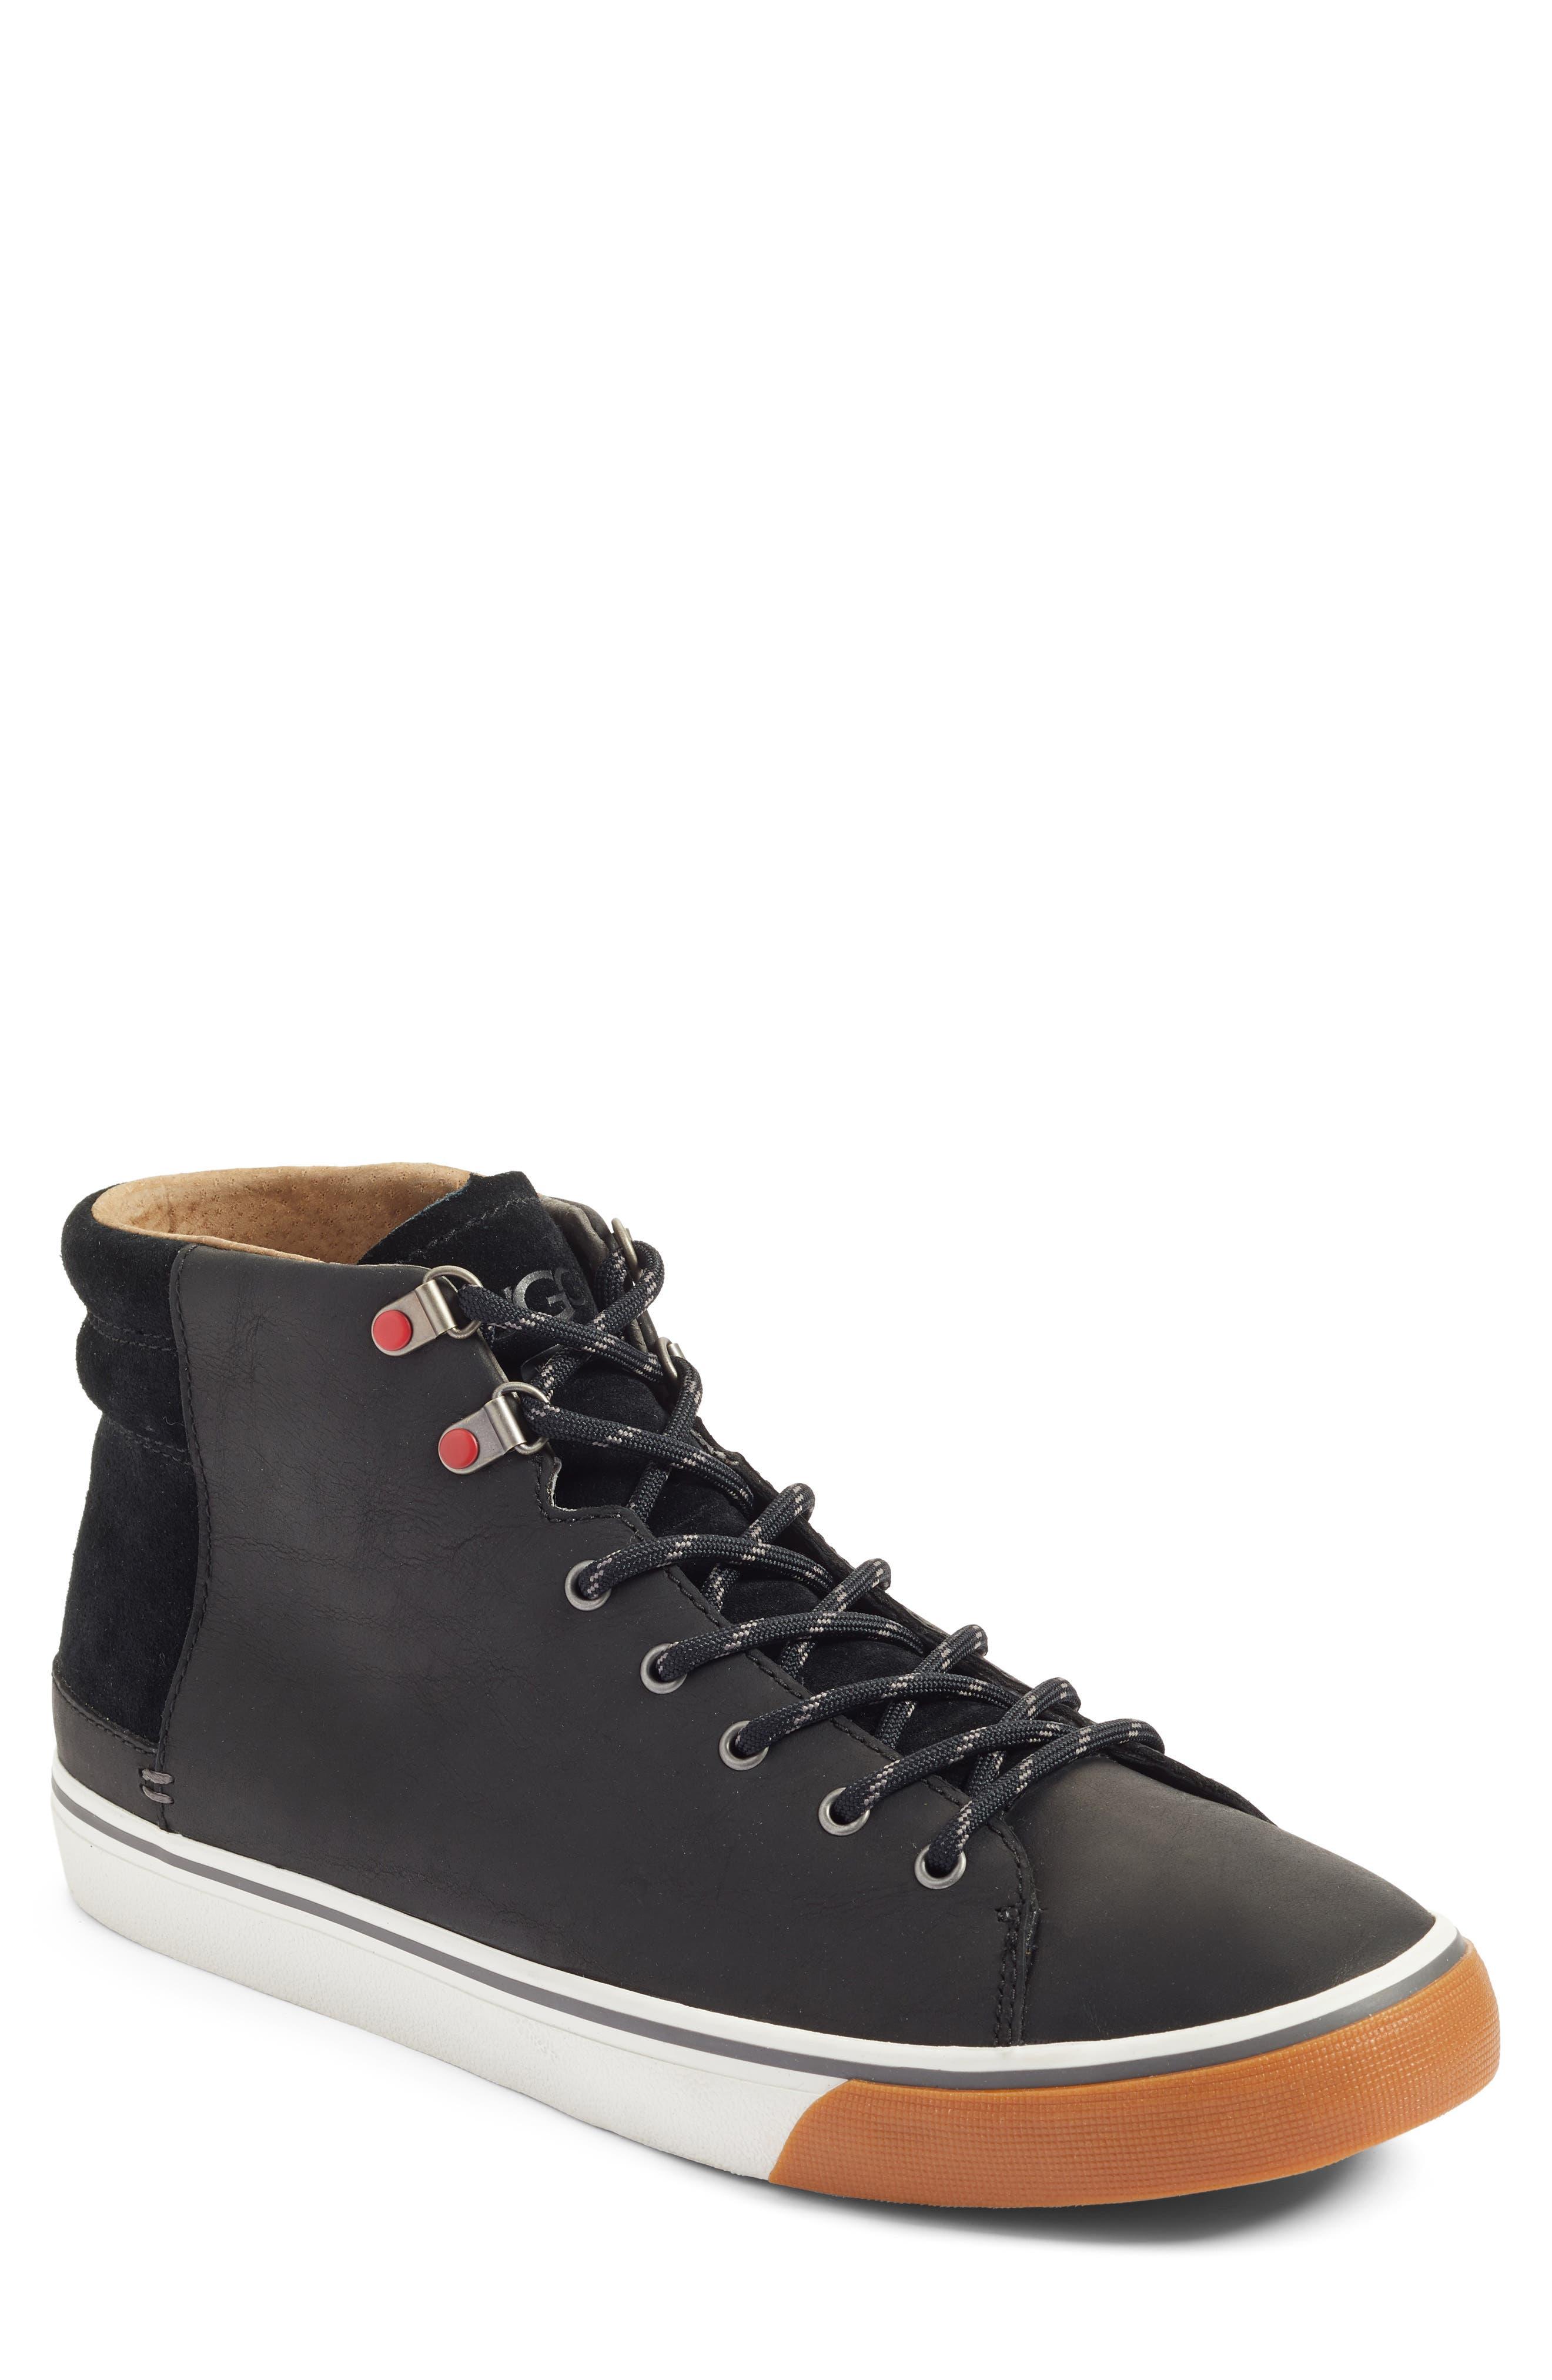 Hoyt High Top Sneaker,                         Main,                         color, 001